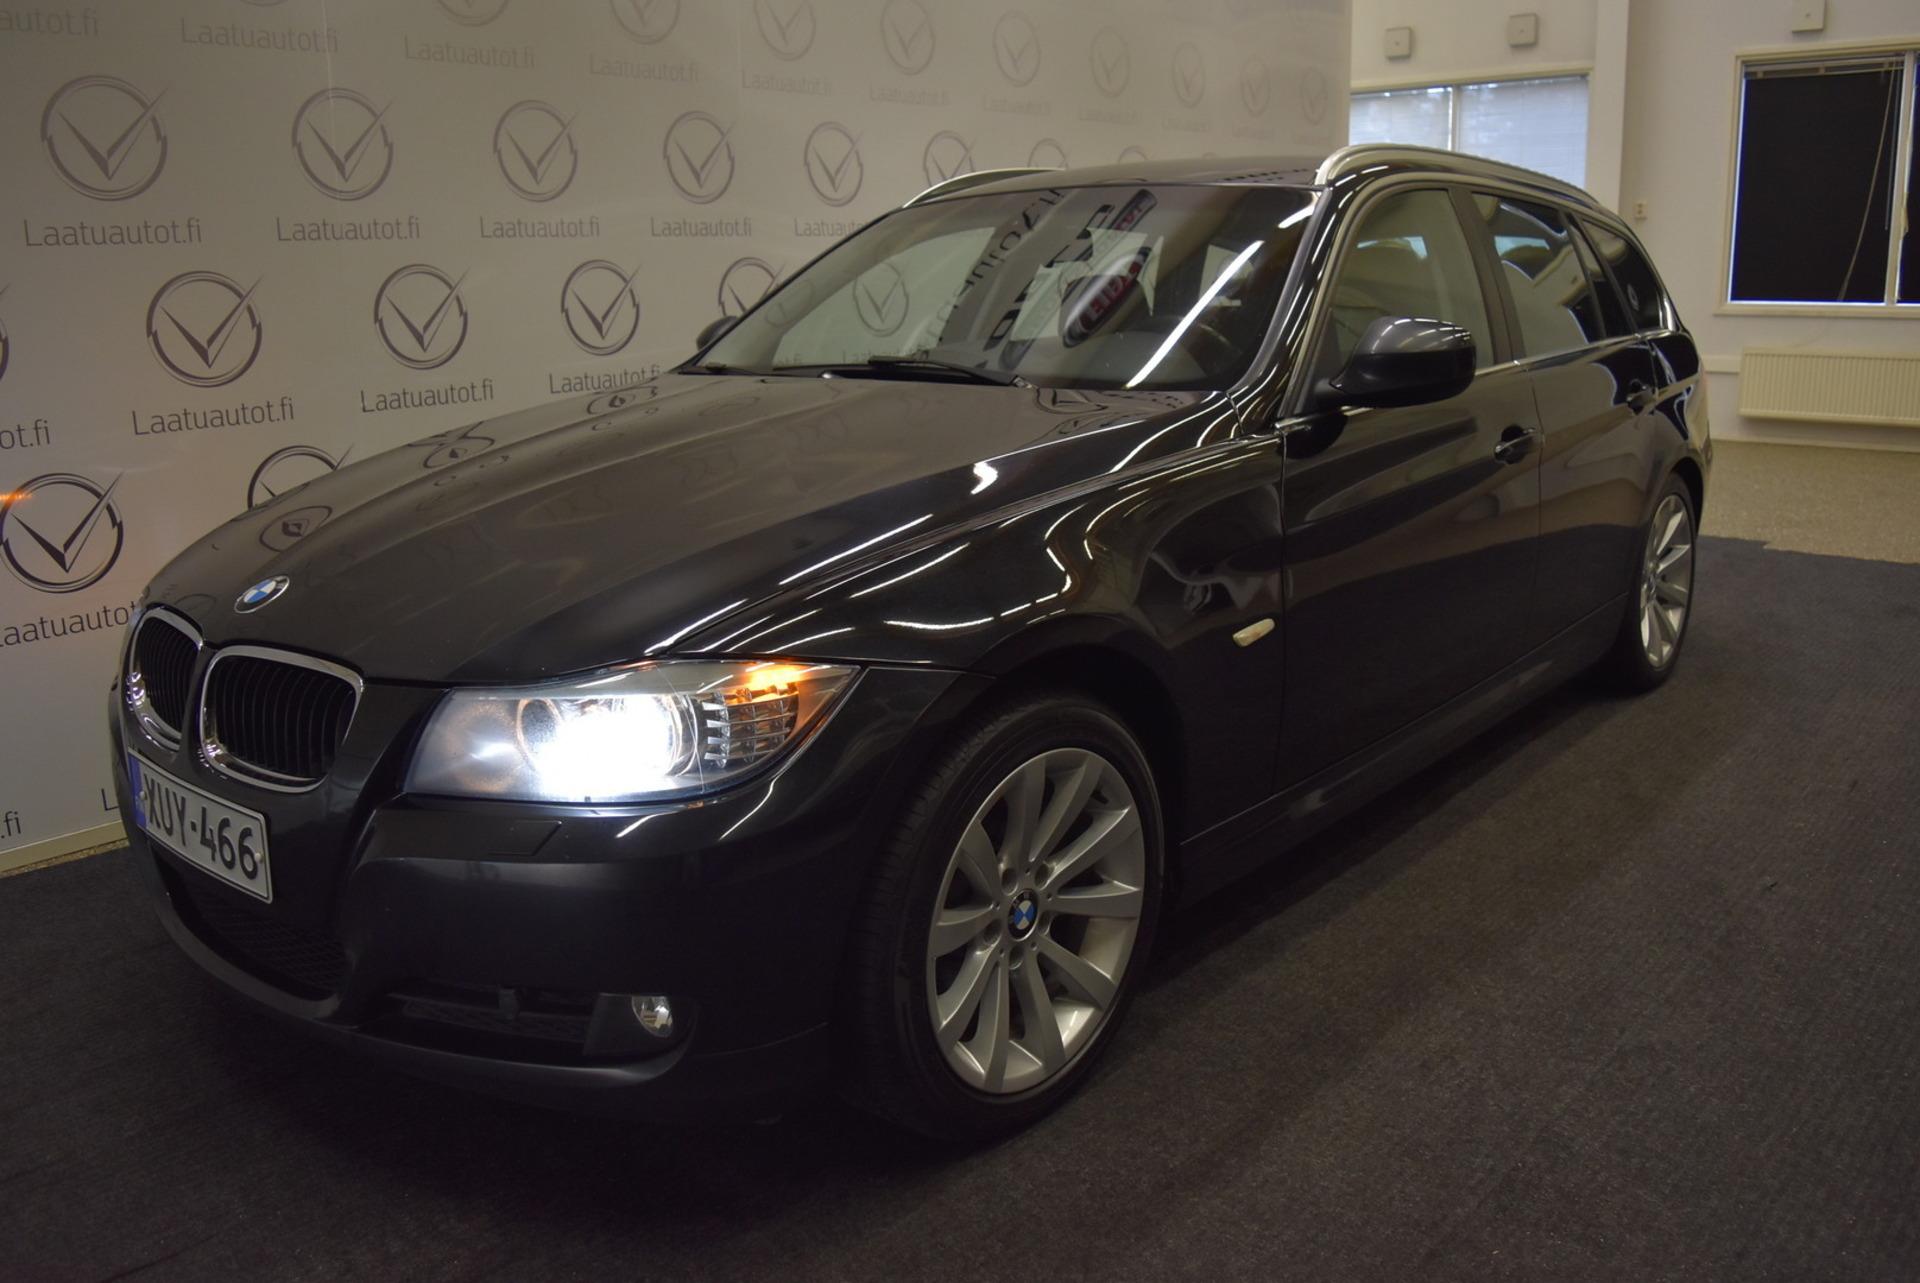 BMW 318 E91 Touring Limited Business Edition - Rahoitus 1.89% jopa ilman käsirahaa! Xenon,  Navi,   AutoAc,  Cruise,  Vetokoukku